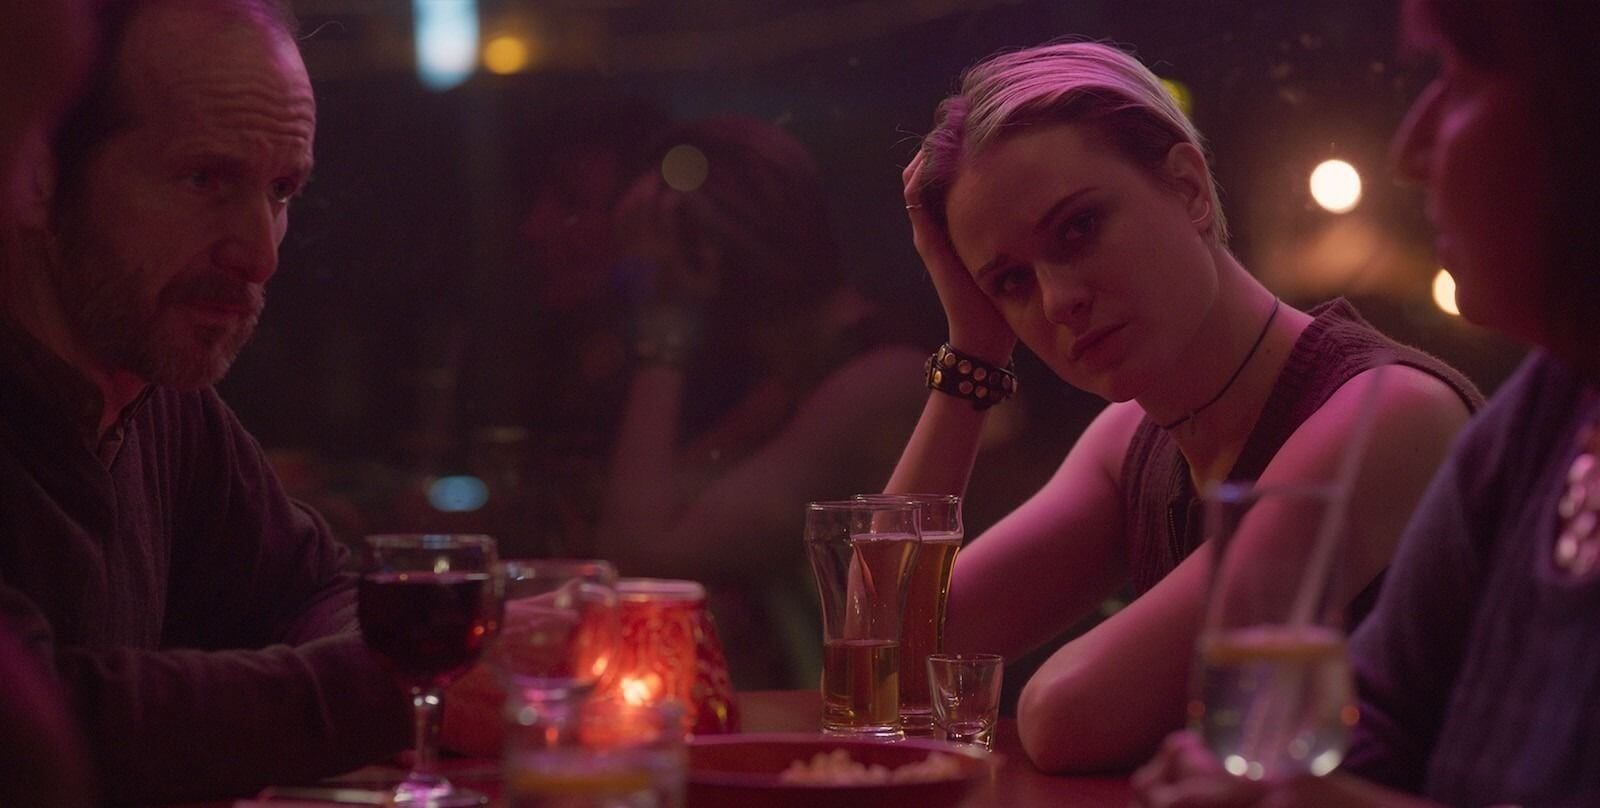 Allure 2017 Spoiler Free Movie Review - Palm Springs International Film Festival 2018